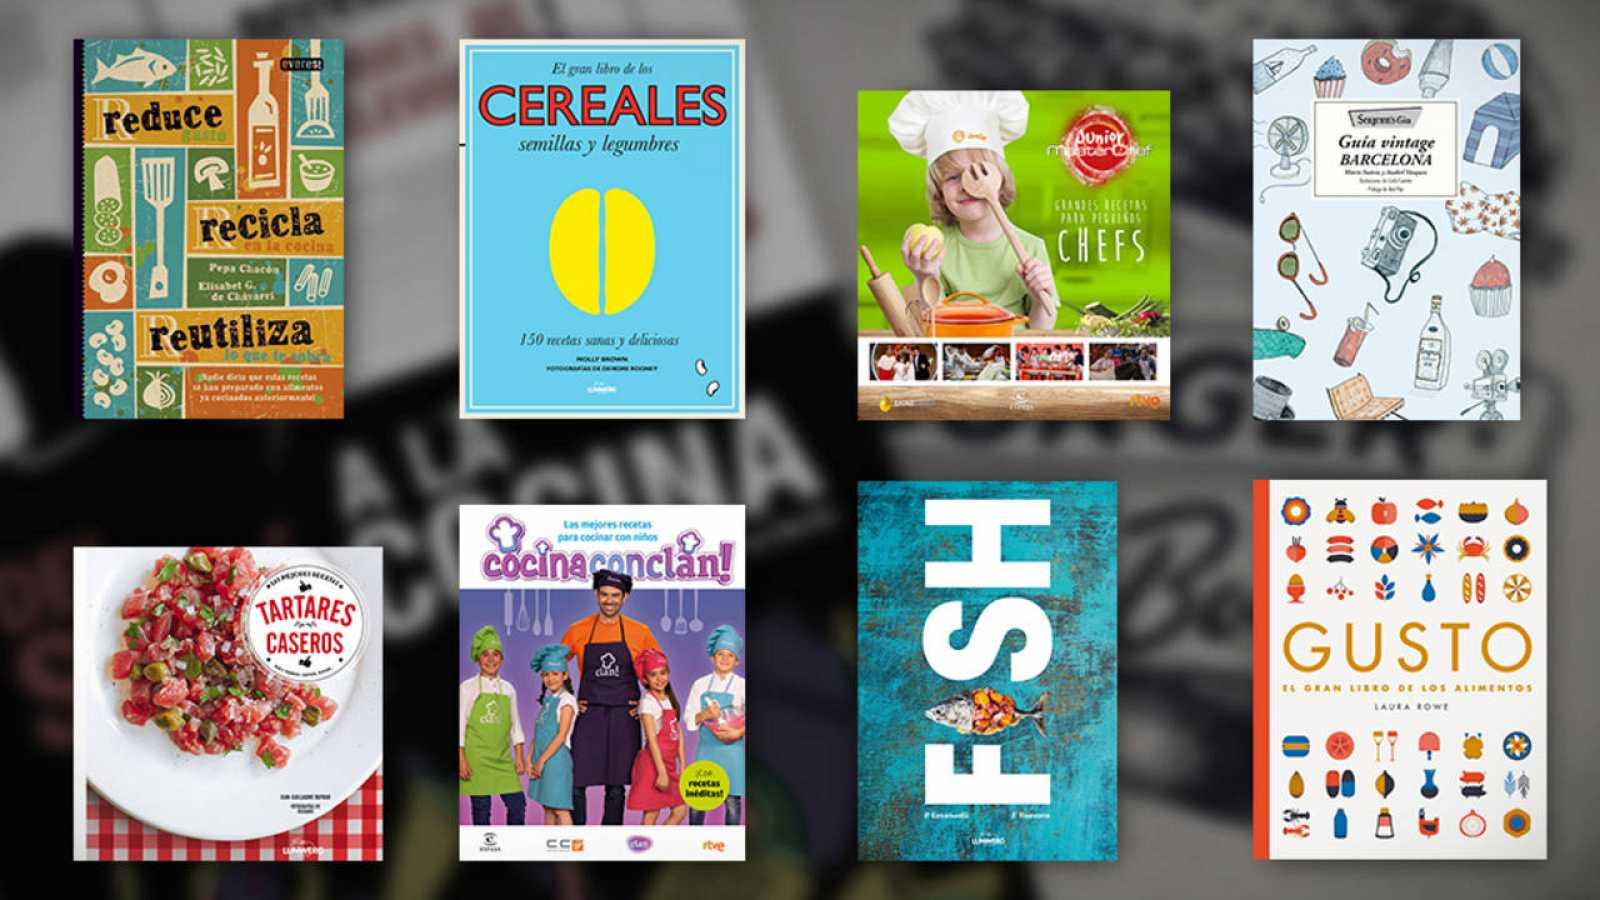 11 libros de cocina para regalar estas navidades: dime a quién ...